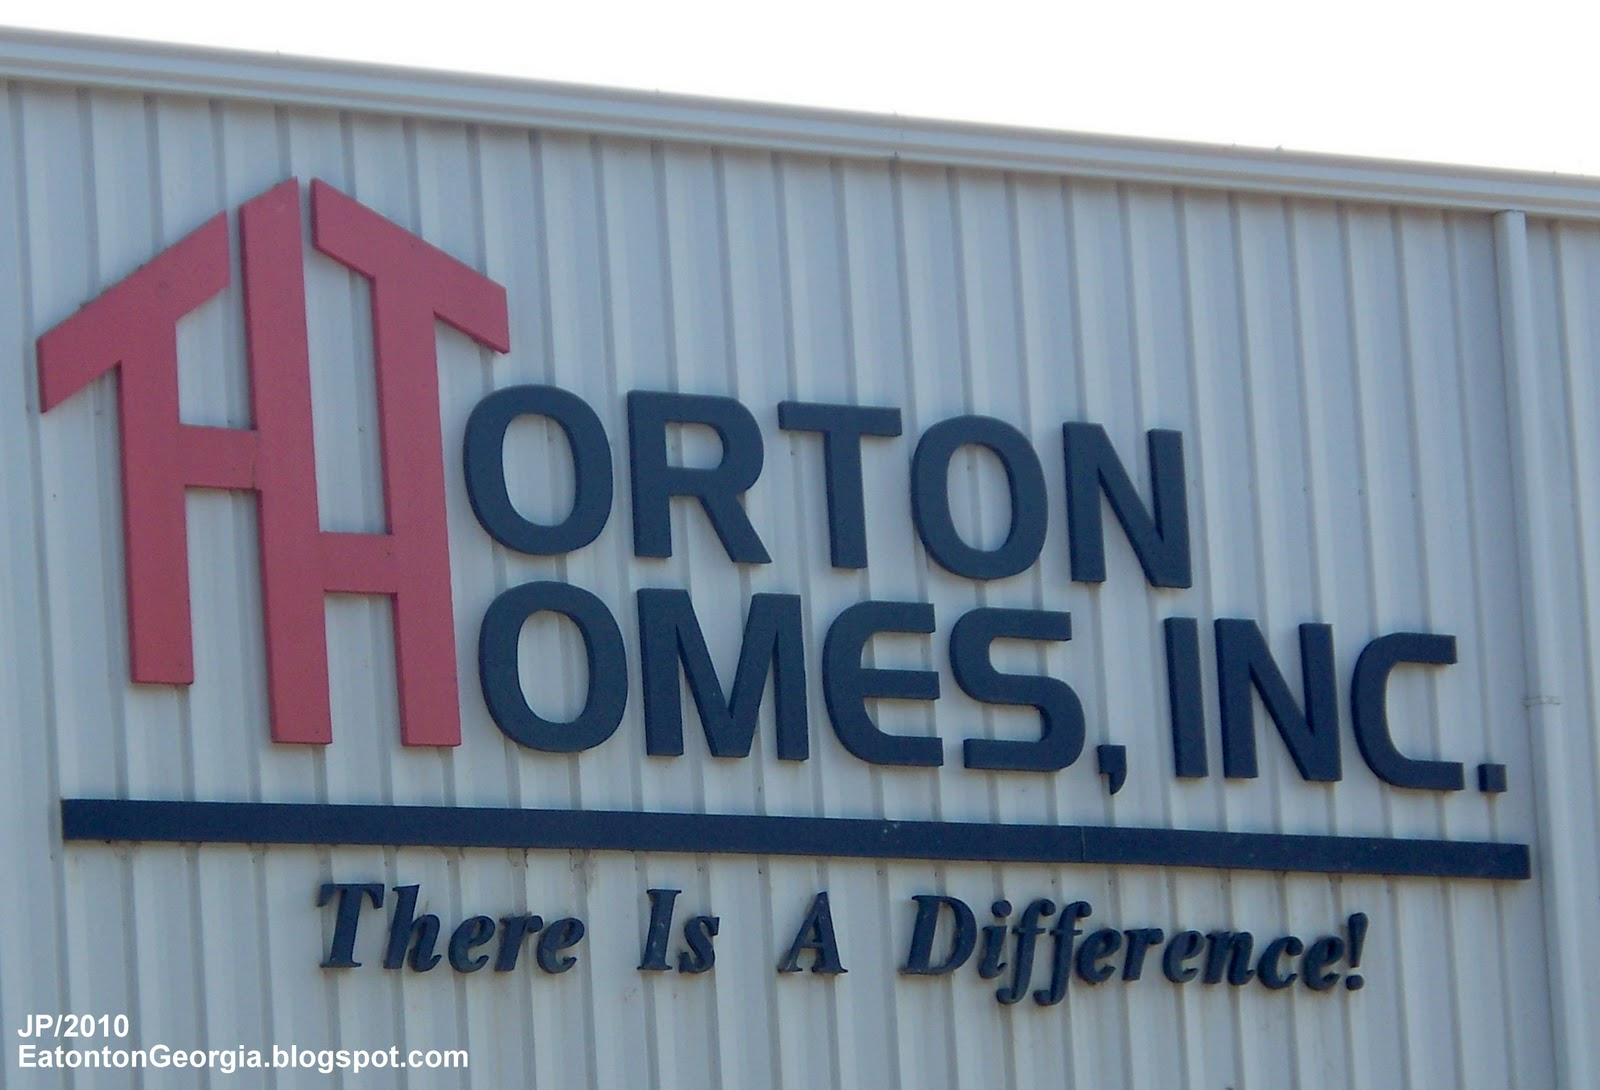 Horton Homes Dublin Ga